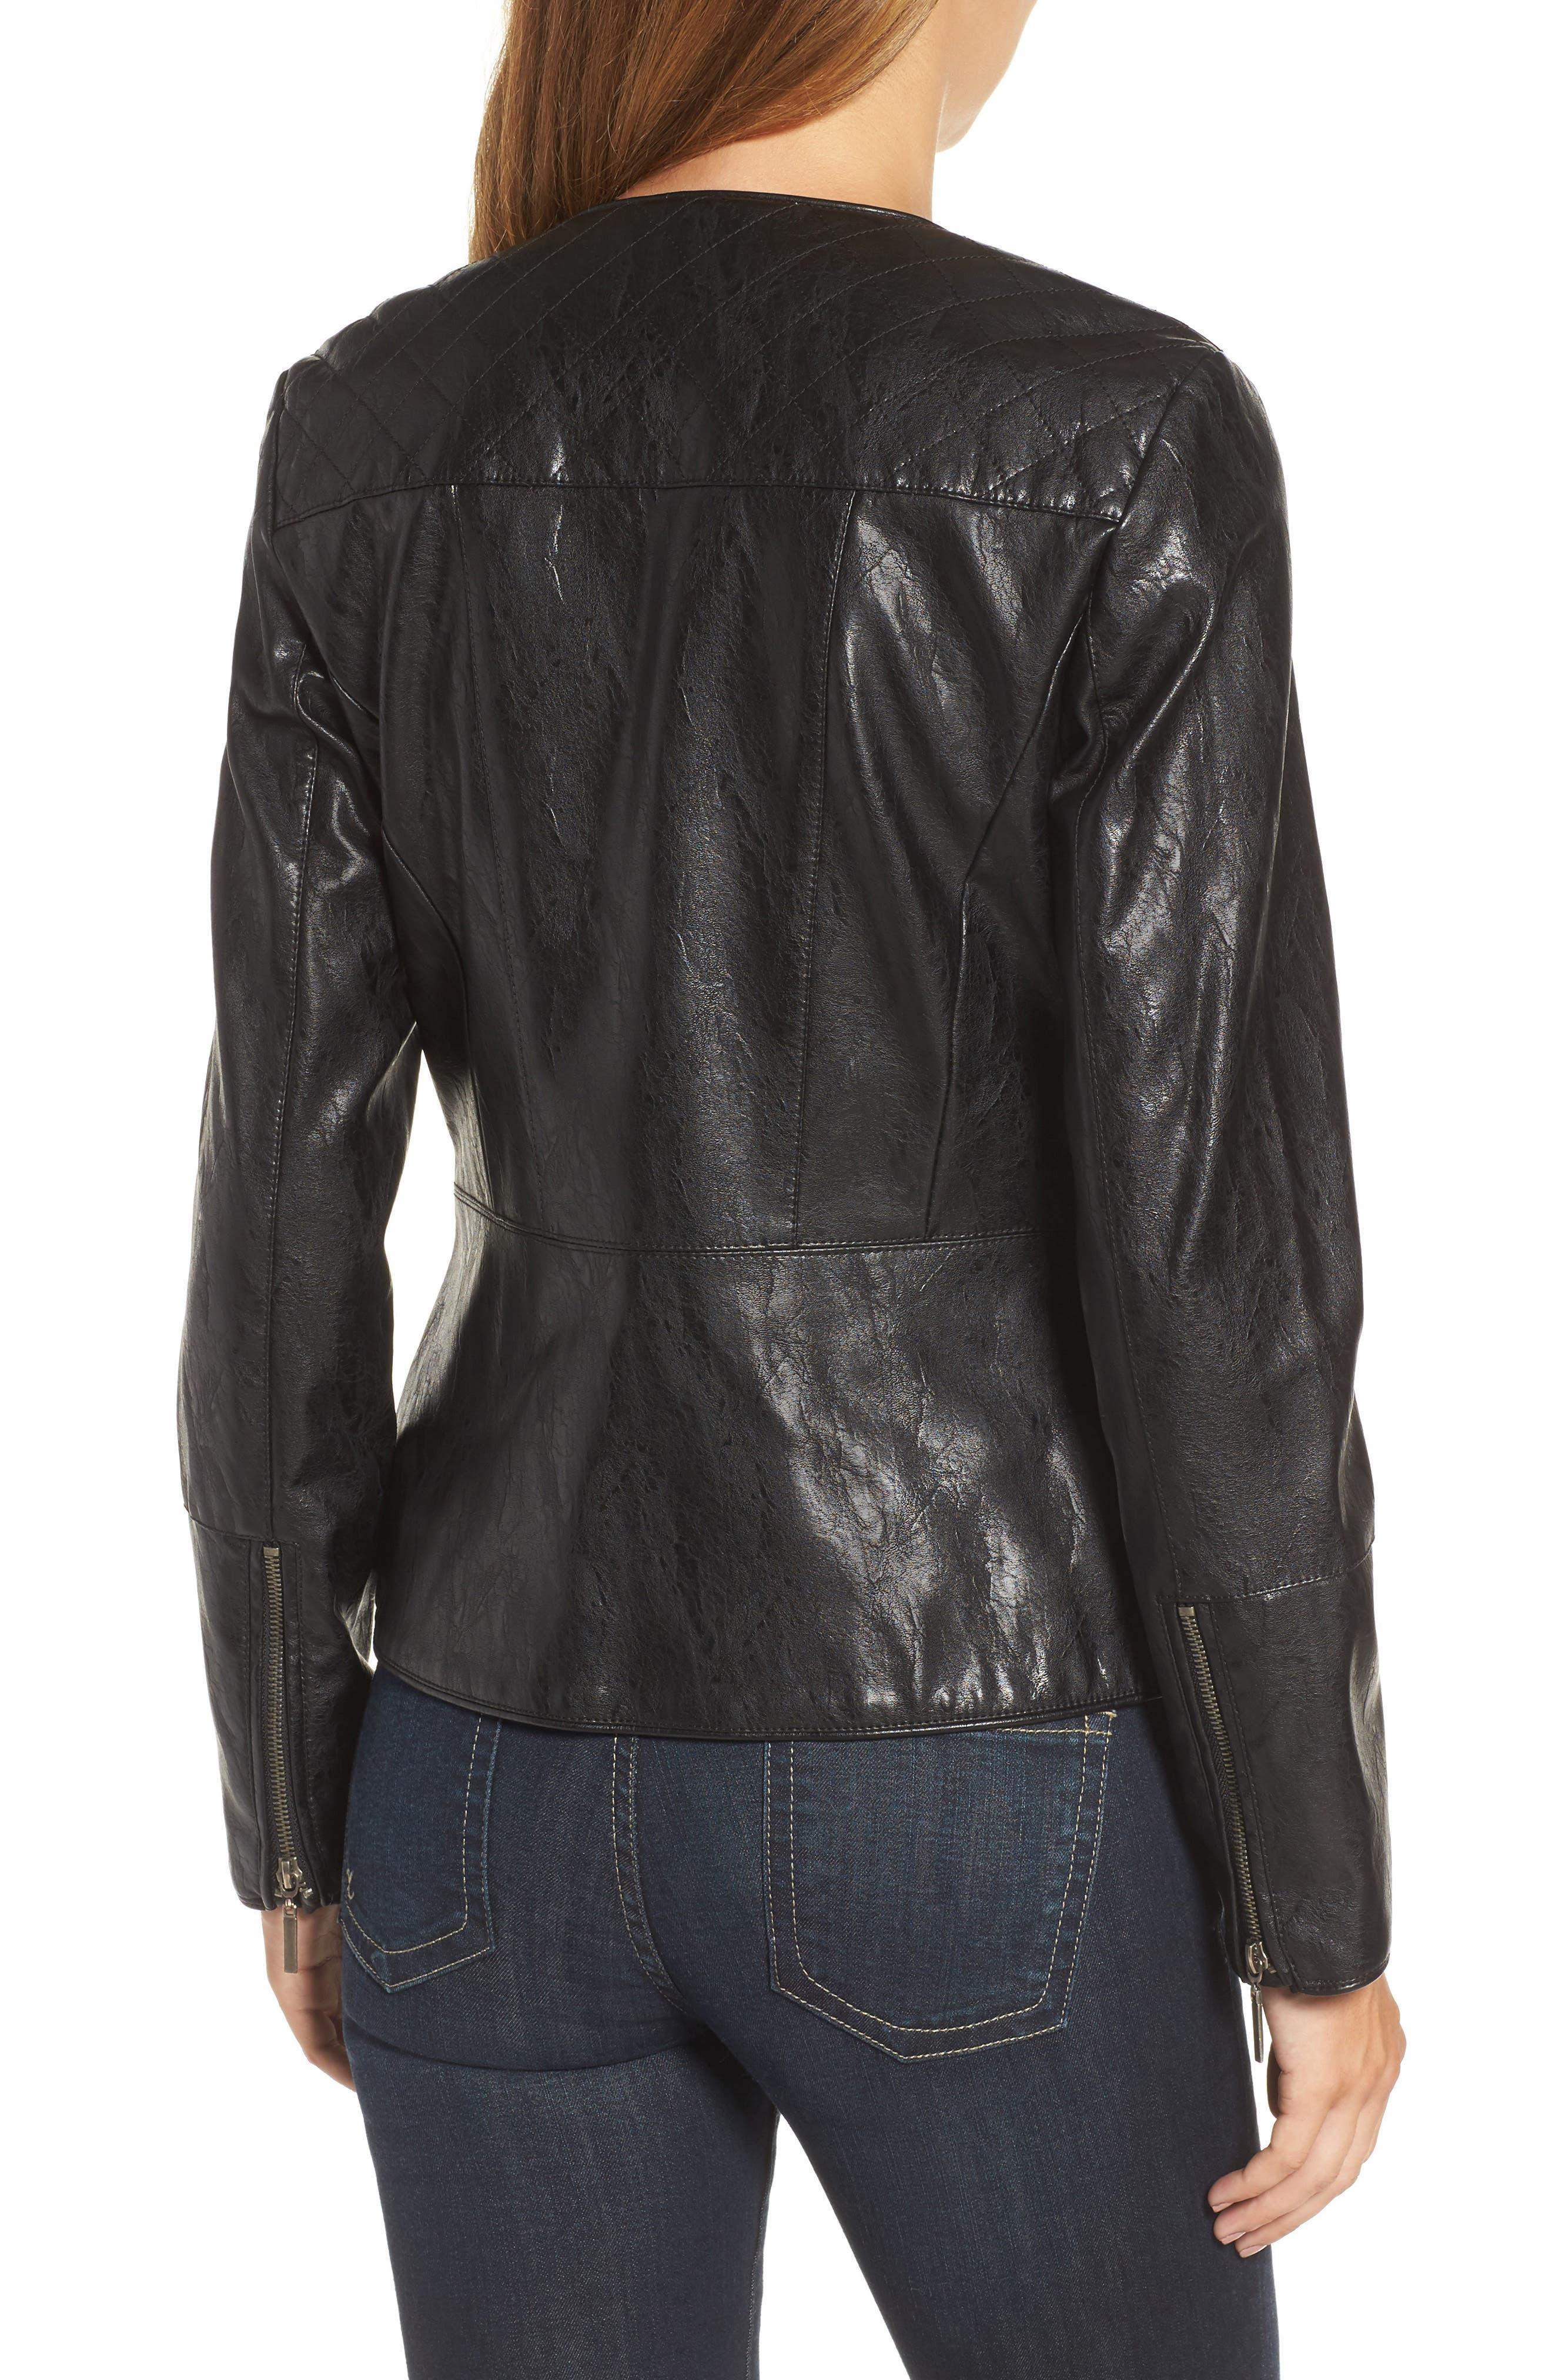 Brandy Motocross Jacket,                             Alternate thumbnail 2, color,                             002